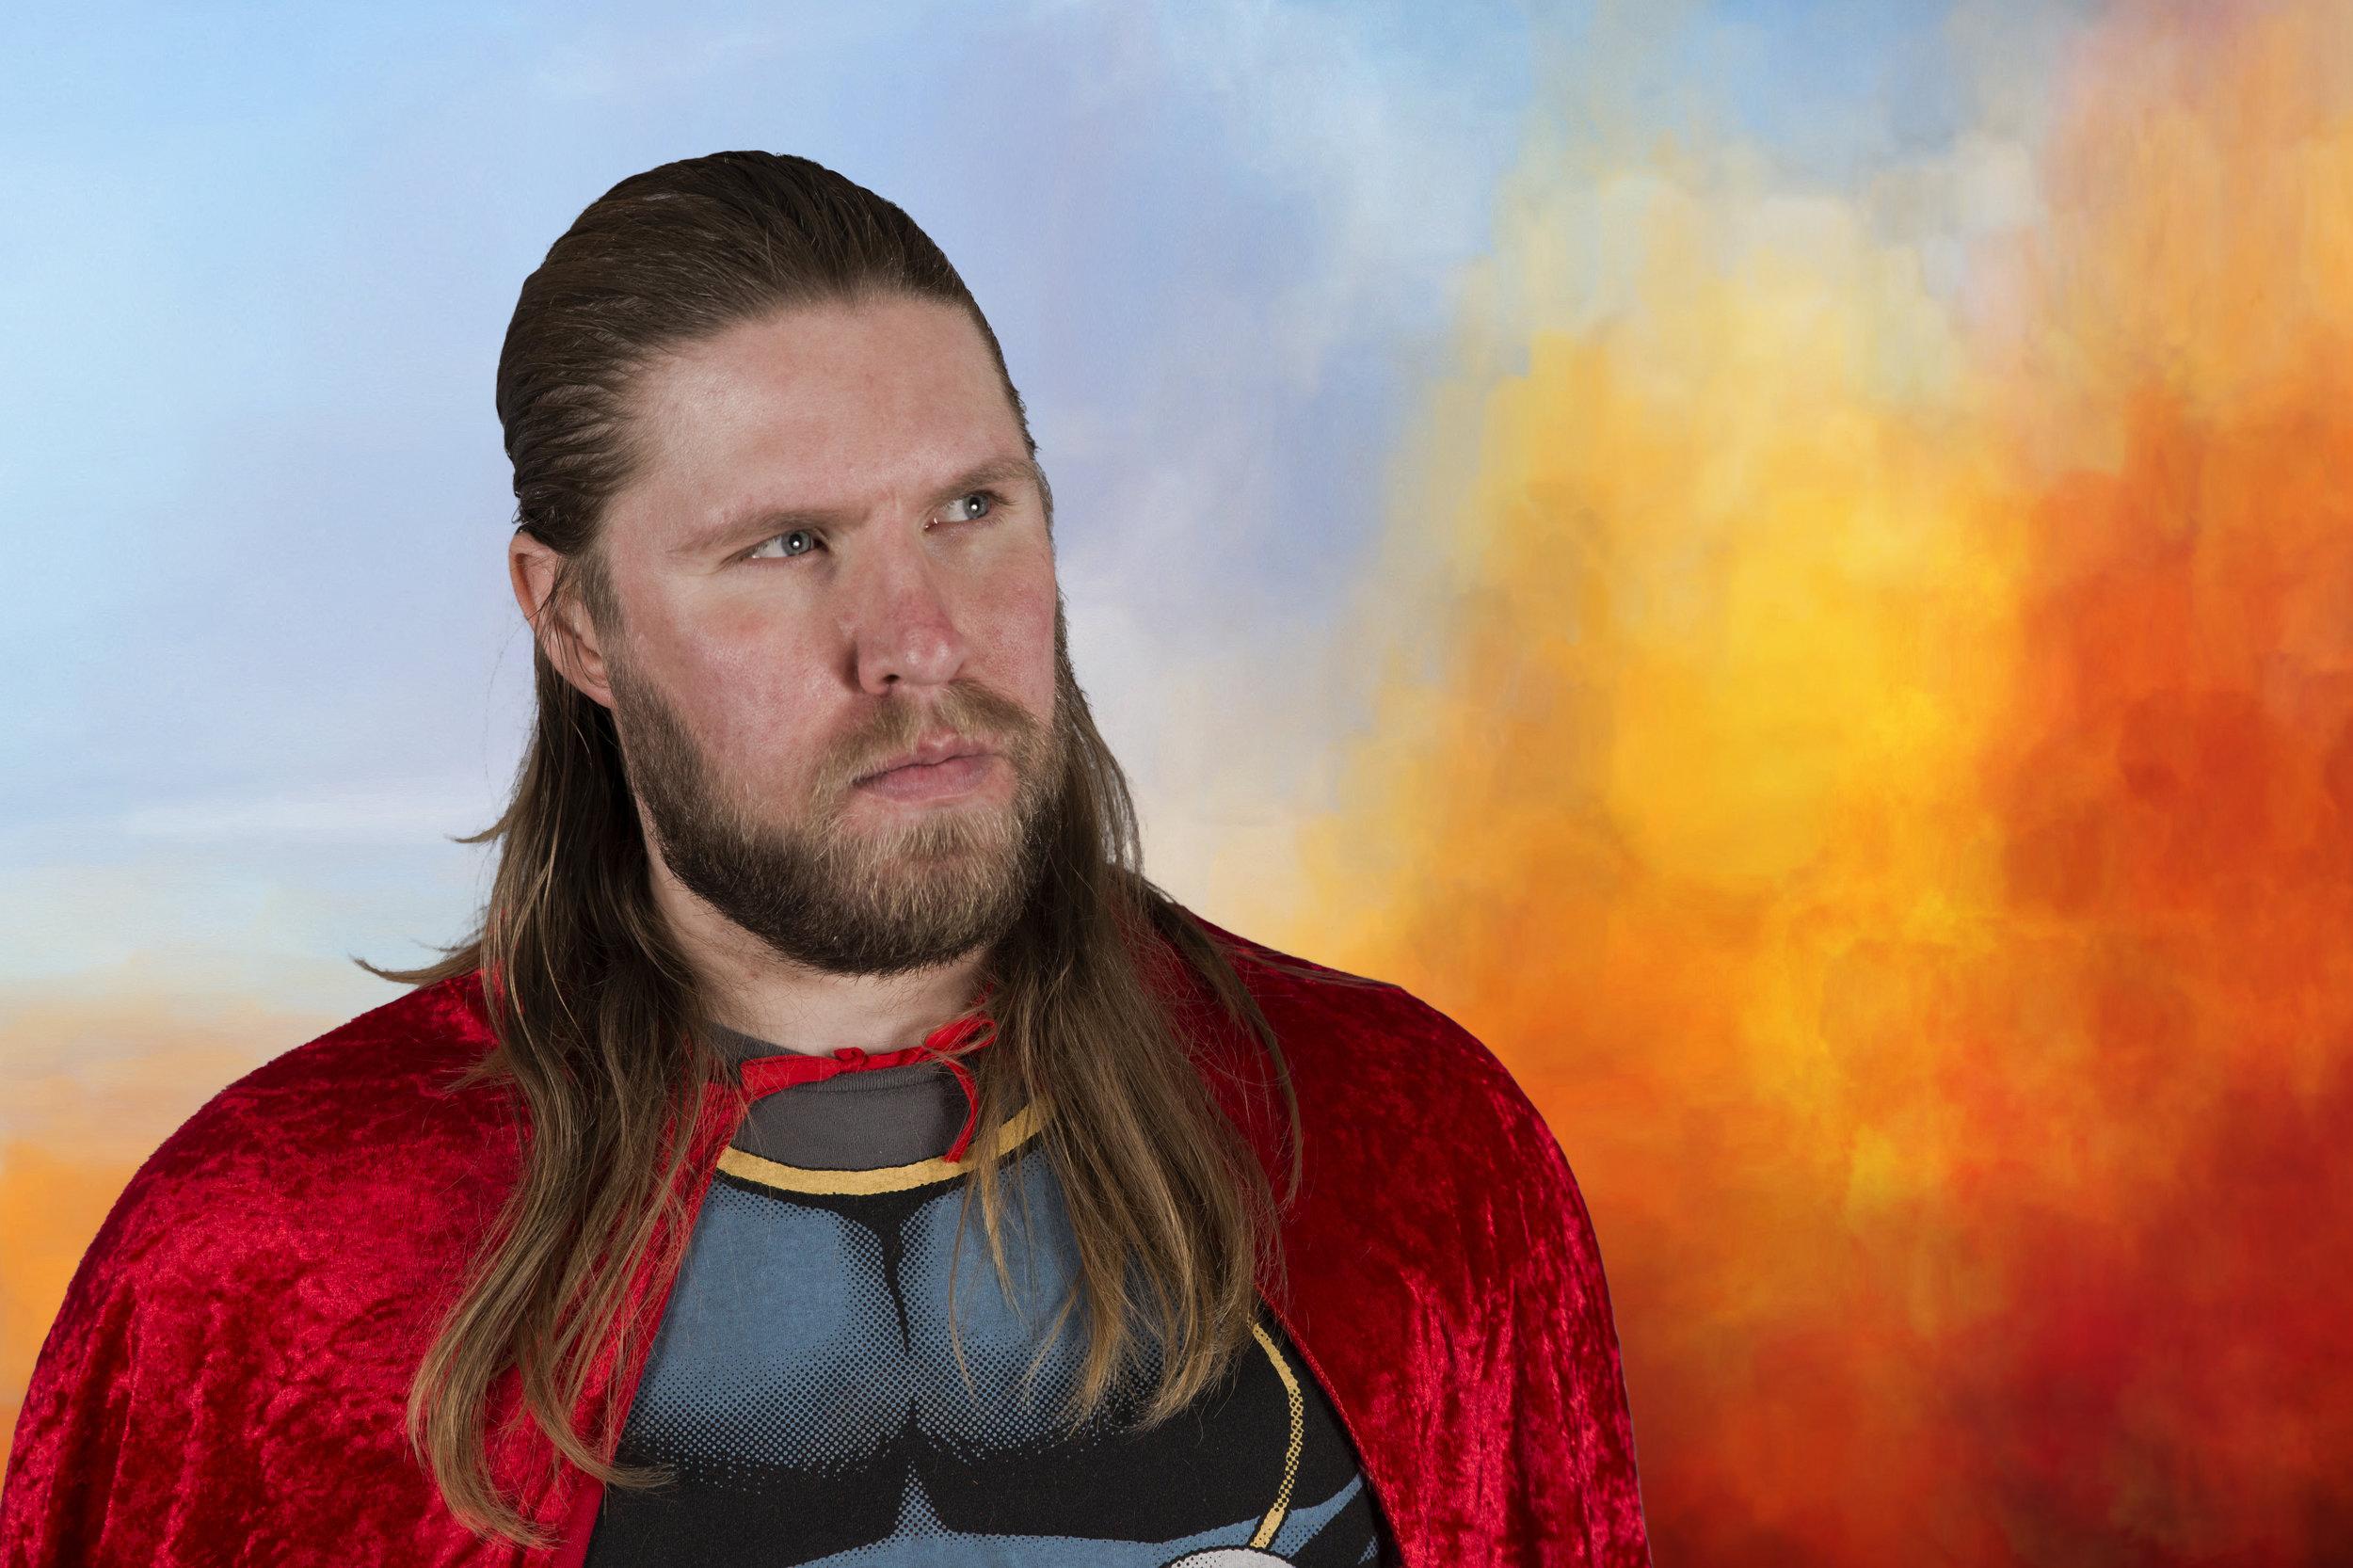 Thor-portrait-session5.jpg